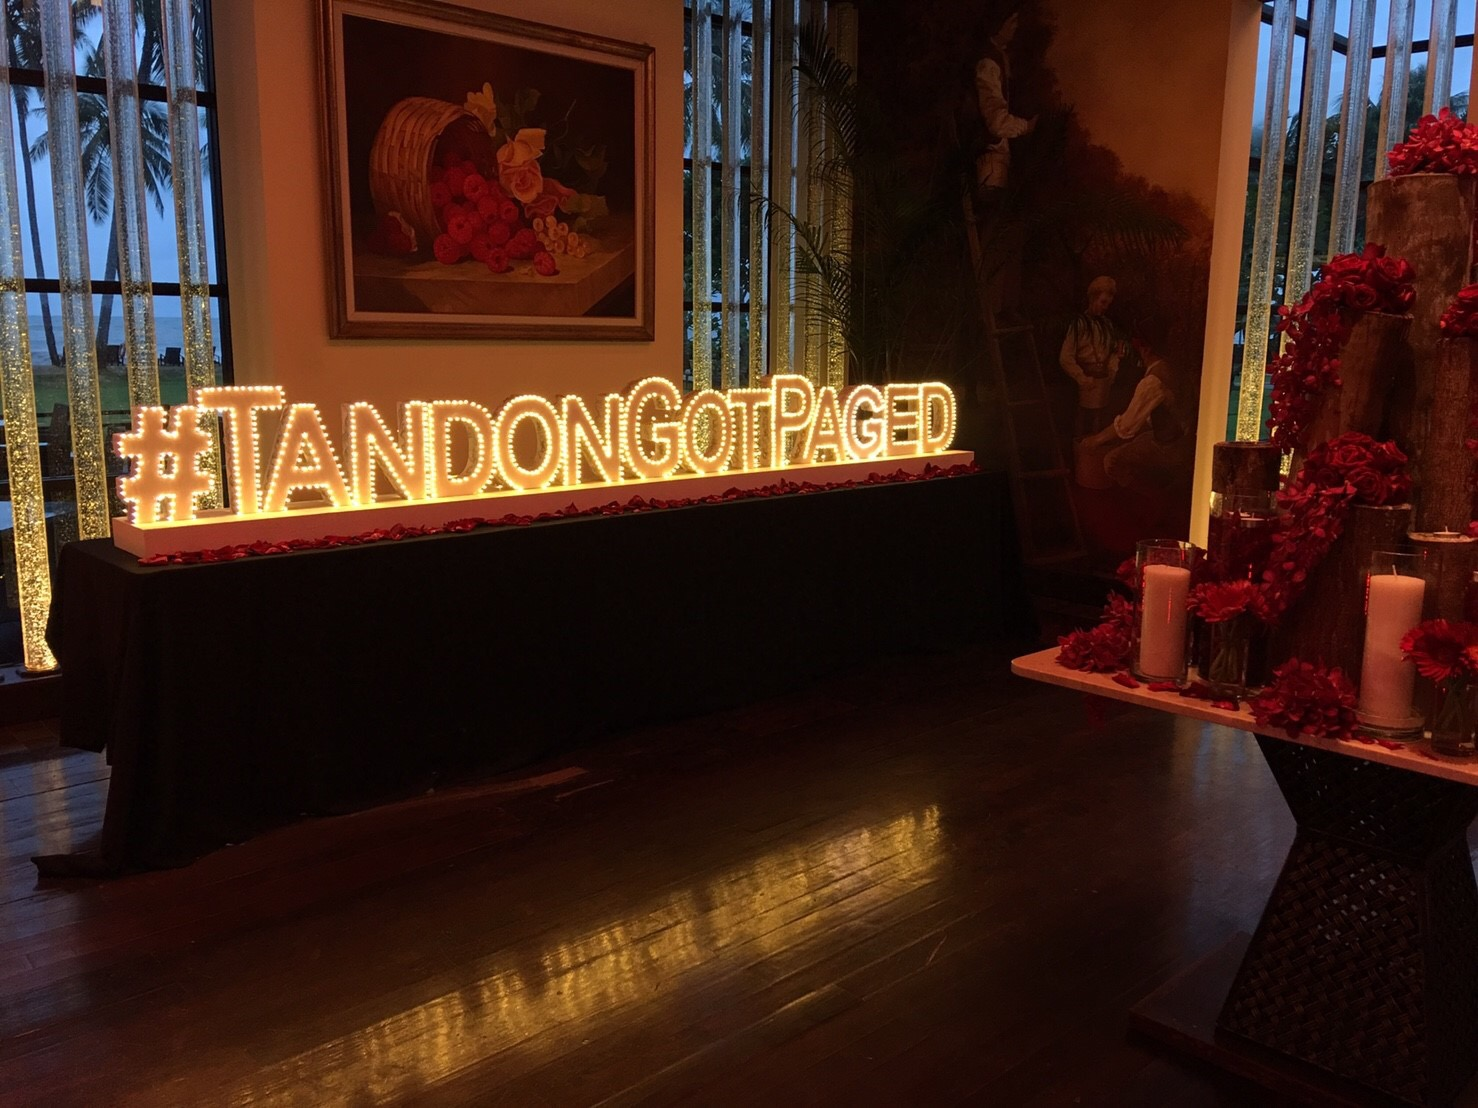 #TandonGotPaged #wizkim #thailand #wedtease #coupelgoals #indianweddings #destinationweddings #wedtease